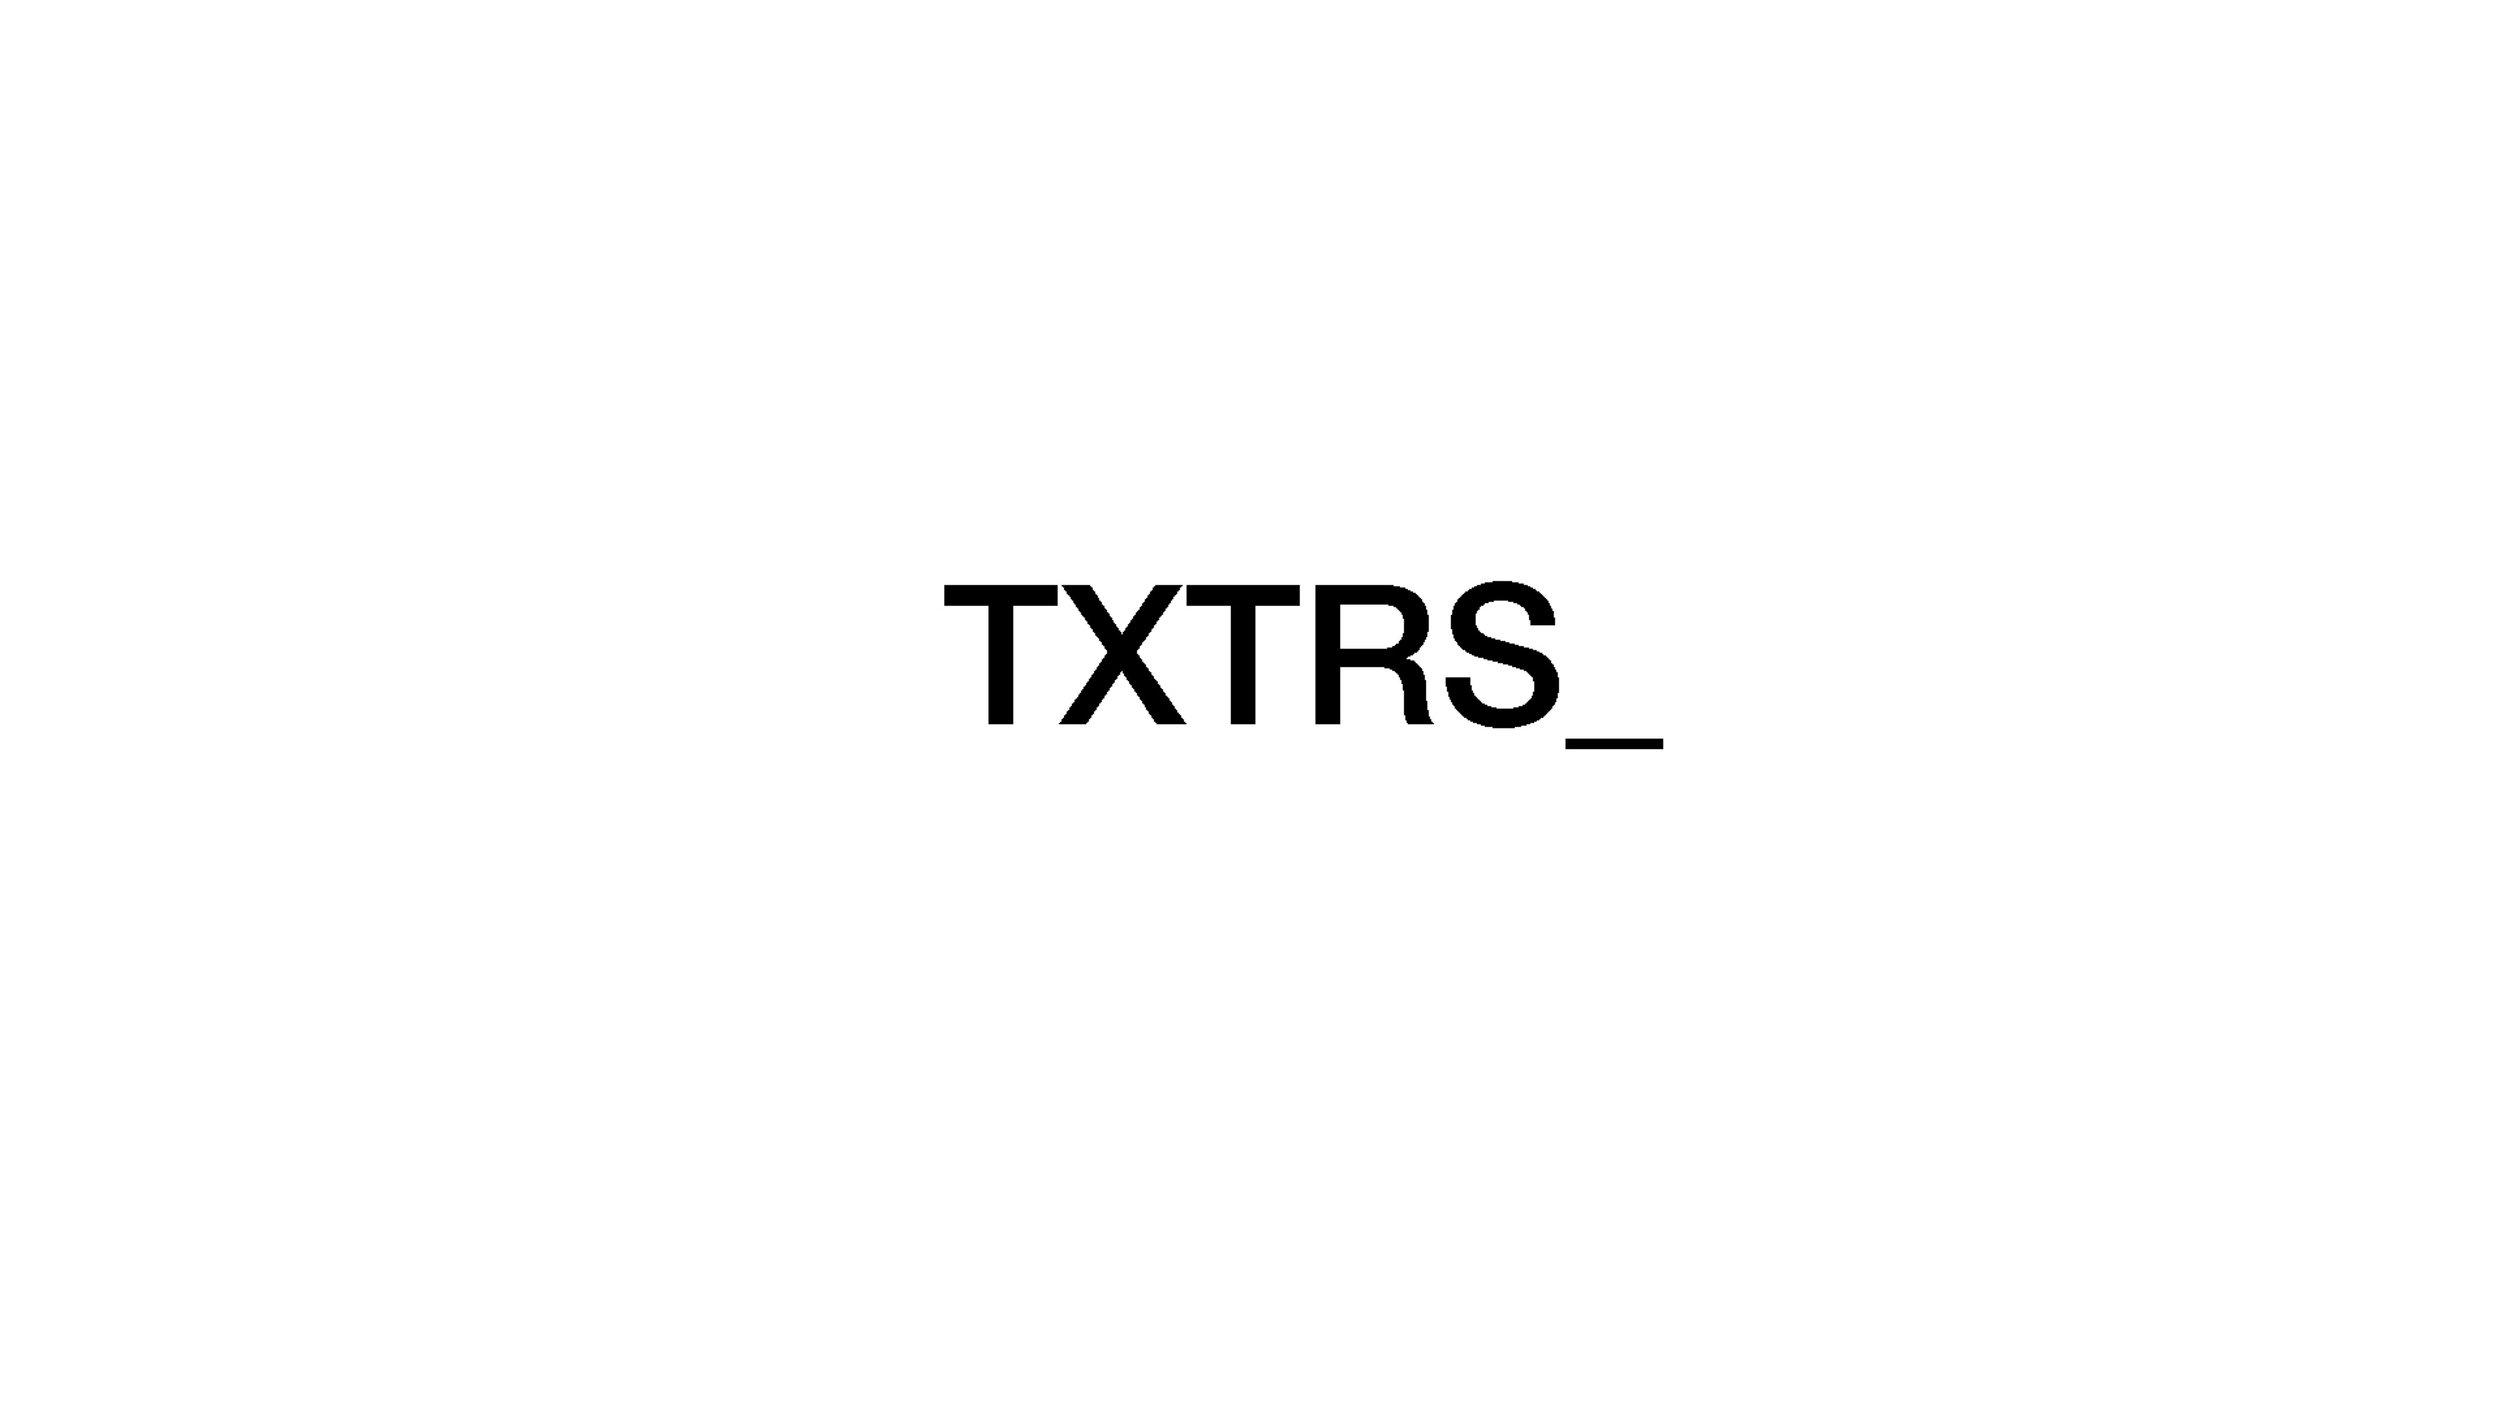 DGTLTXTRSRCCPRJCT1.jpg